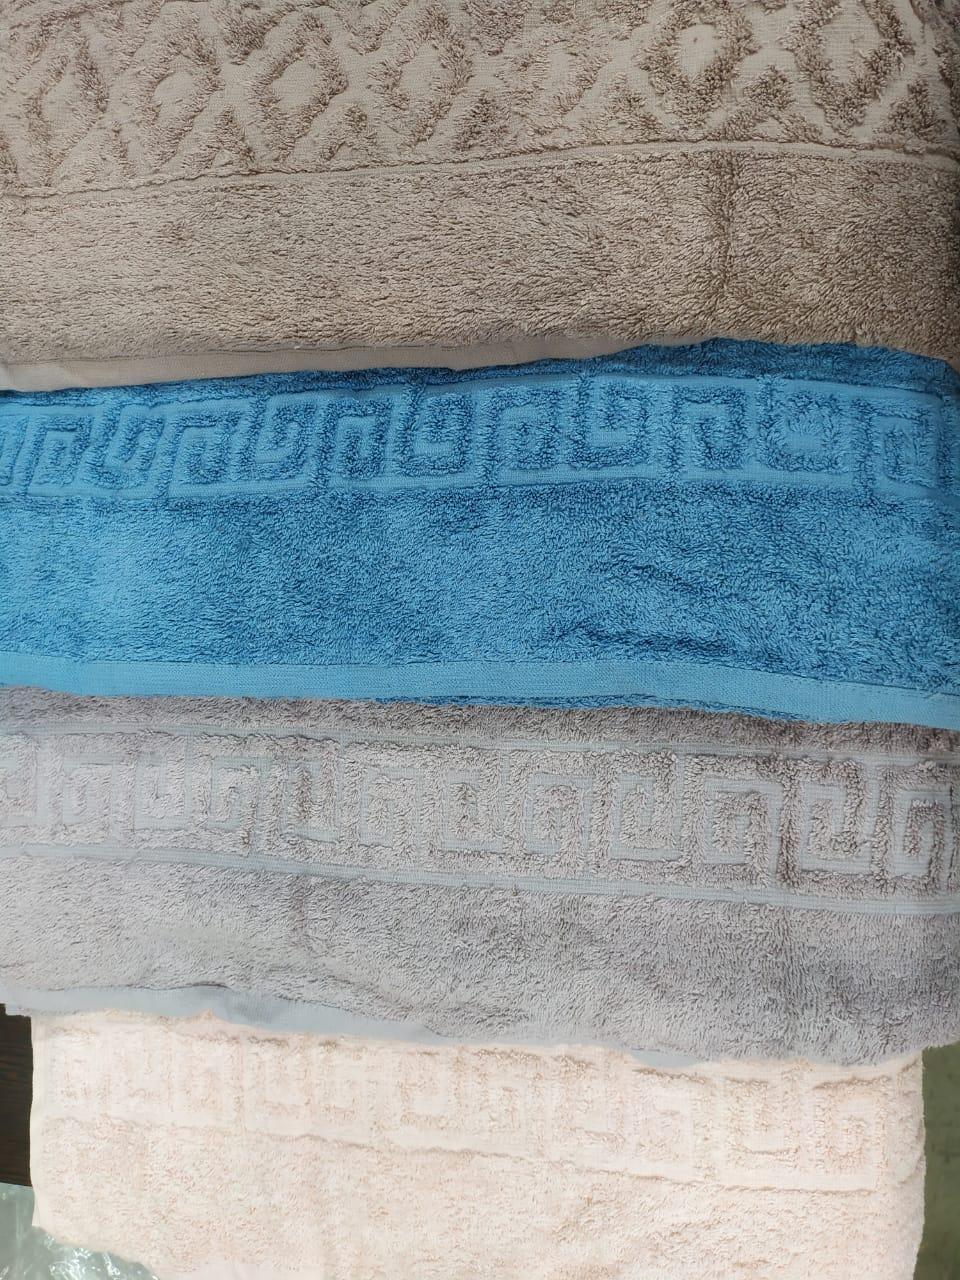 Полотенце банное  про-во Туркменистан 100х180см 800гр цветное